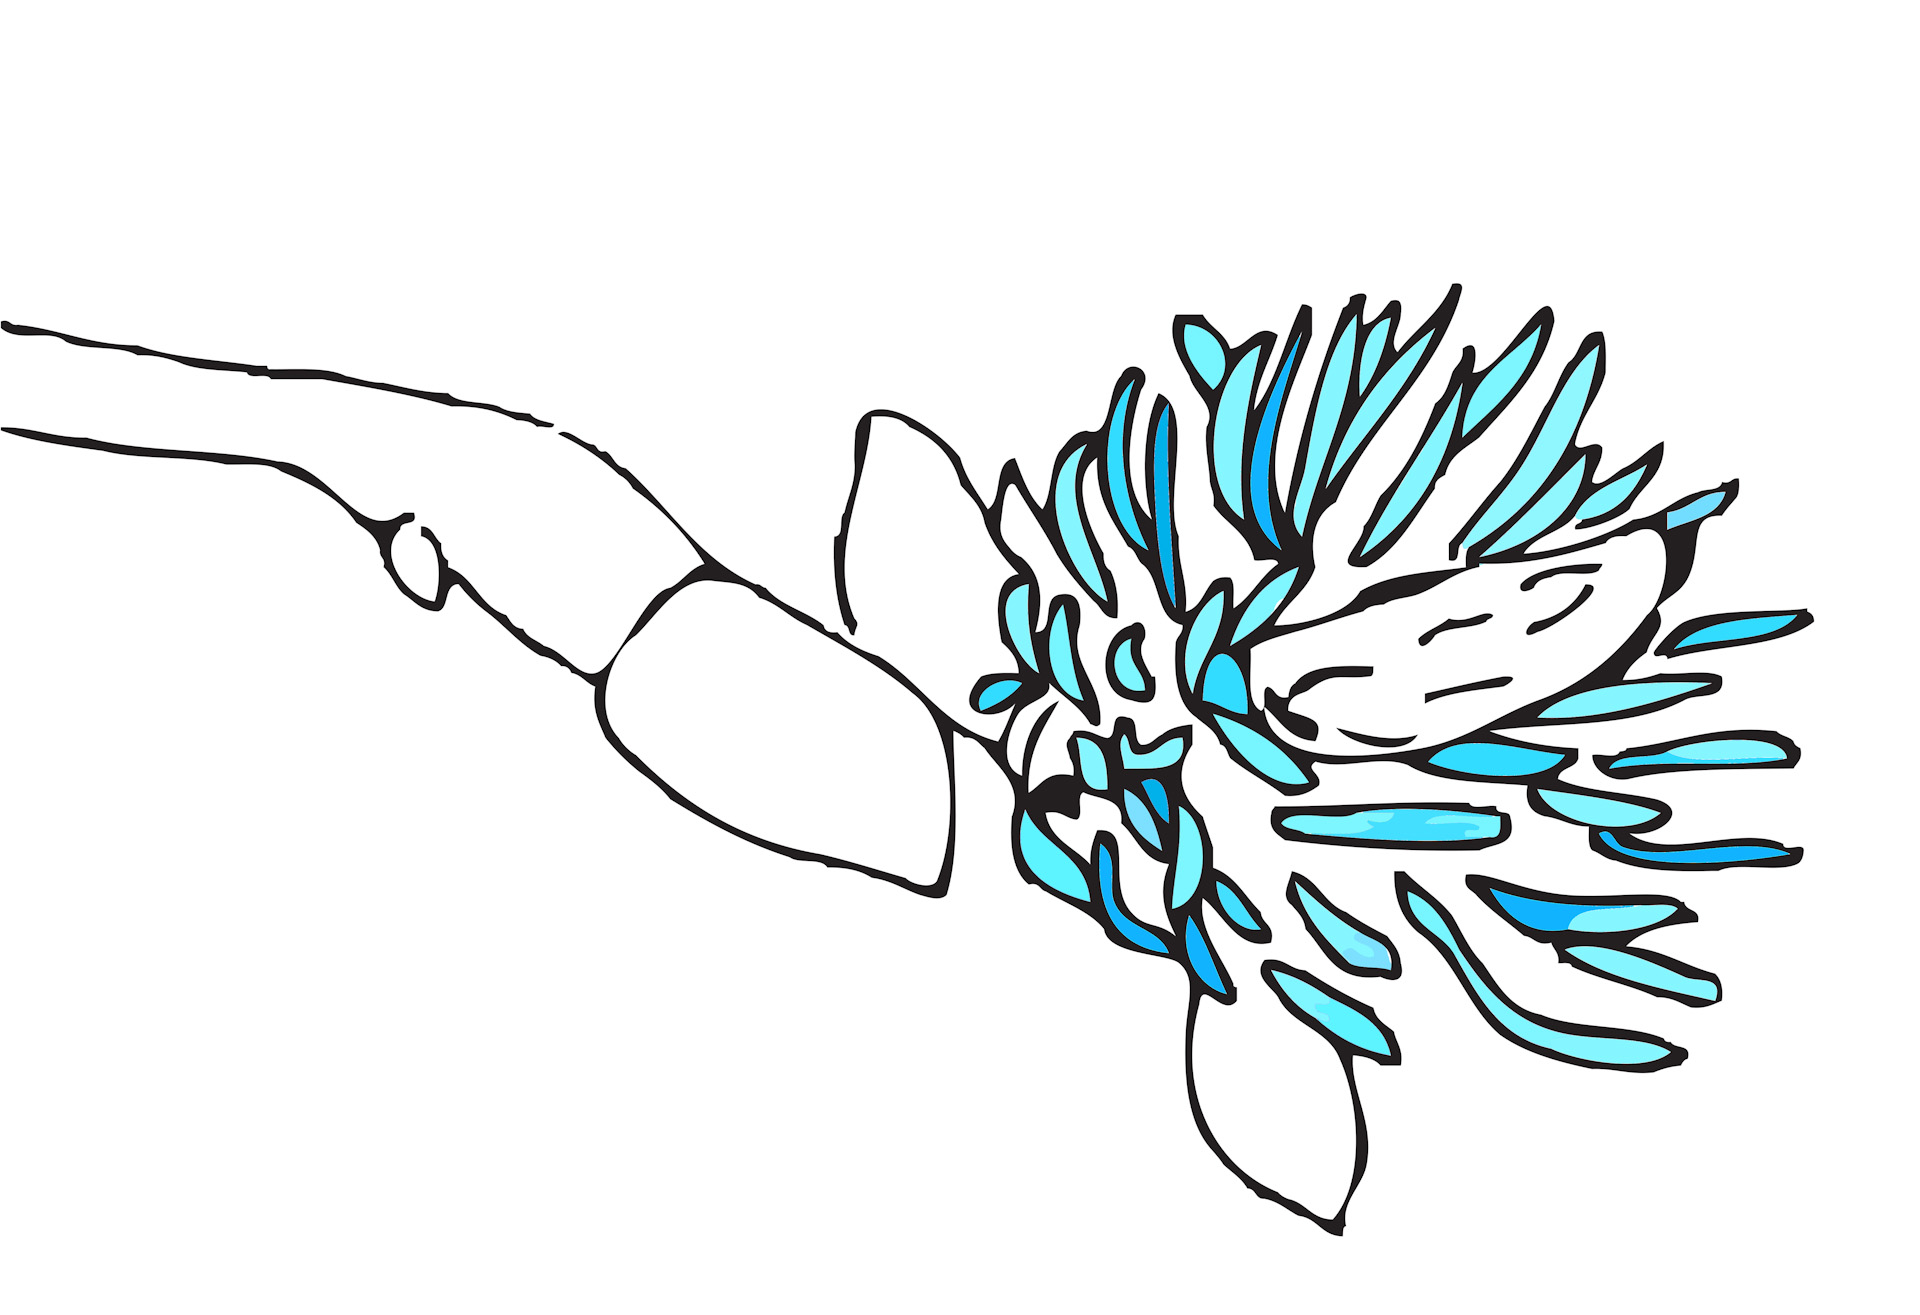 Magnolias 4, manipulated digital drawing